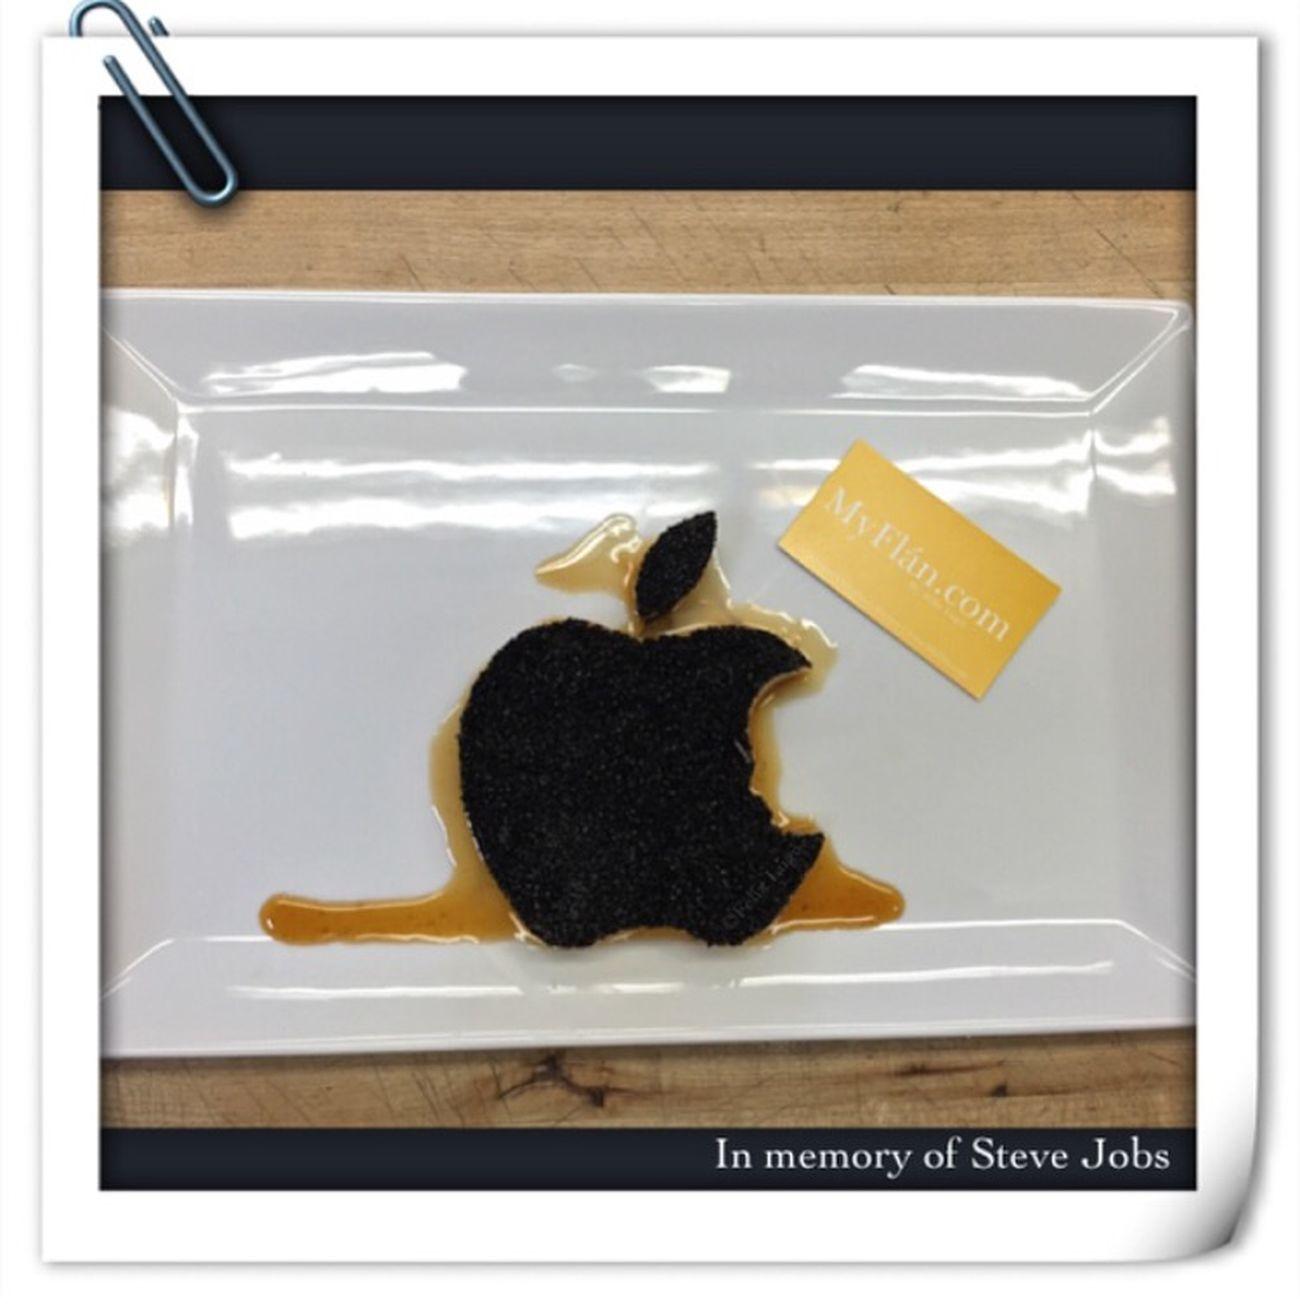 Stevejobs Applelogo Apple Myflan Pudim Flan Pastry Desserts Food Dessert